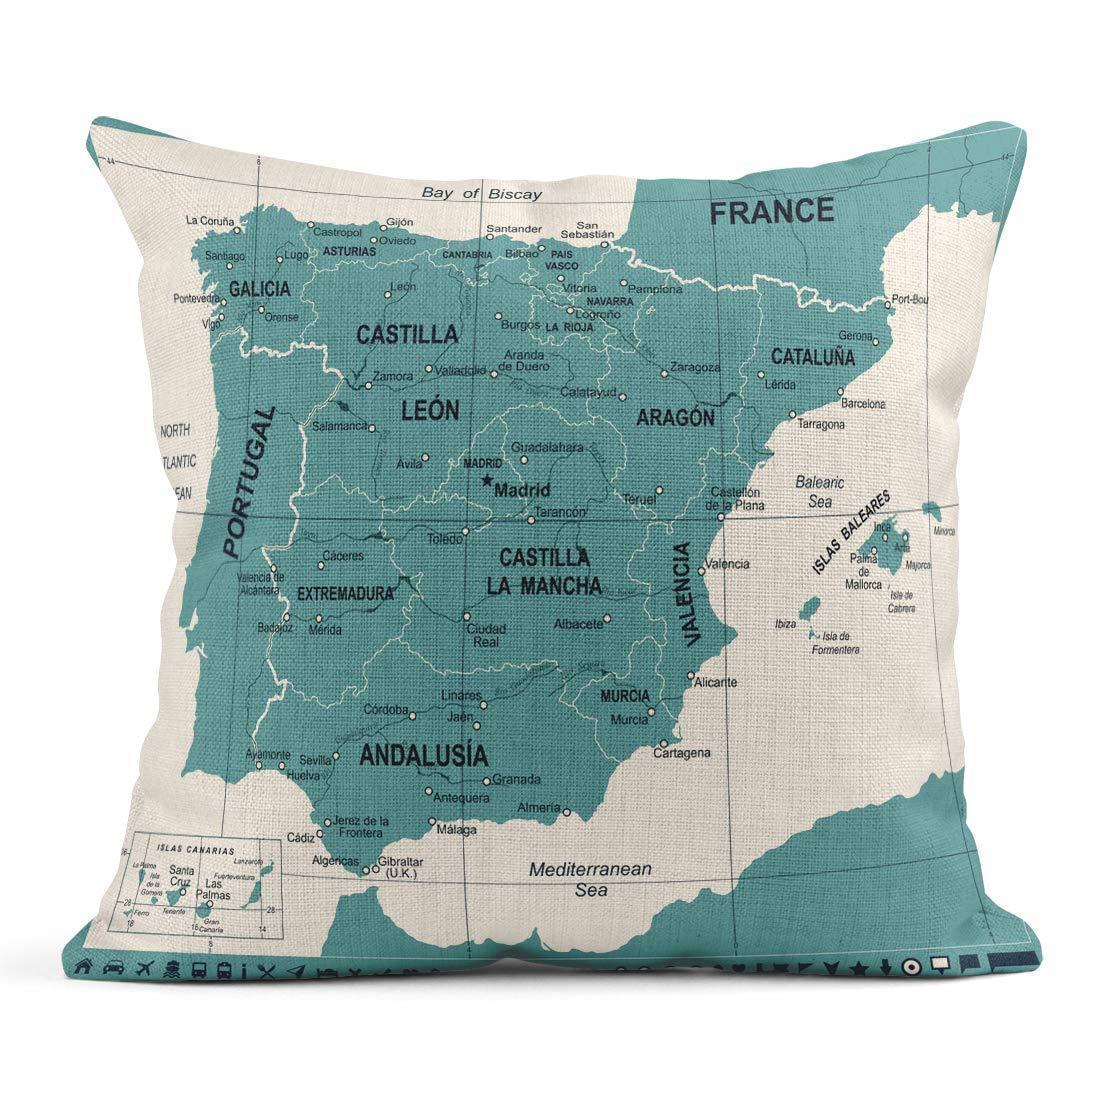 Amazon.com: Emvency Decor Flax Throw Pillow Covers Case ...